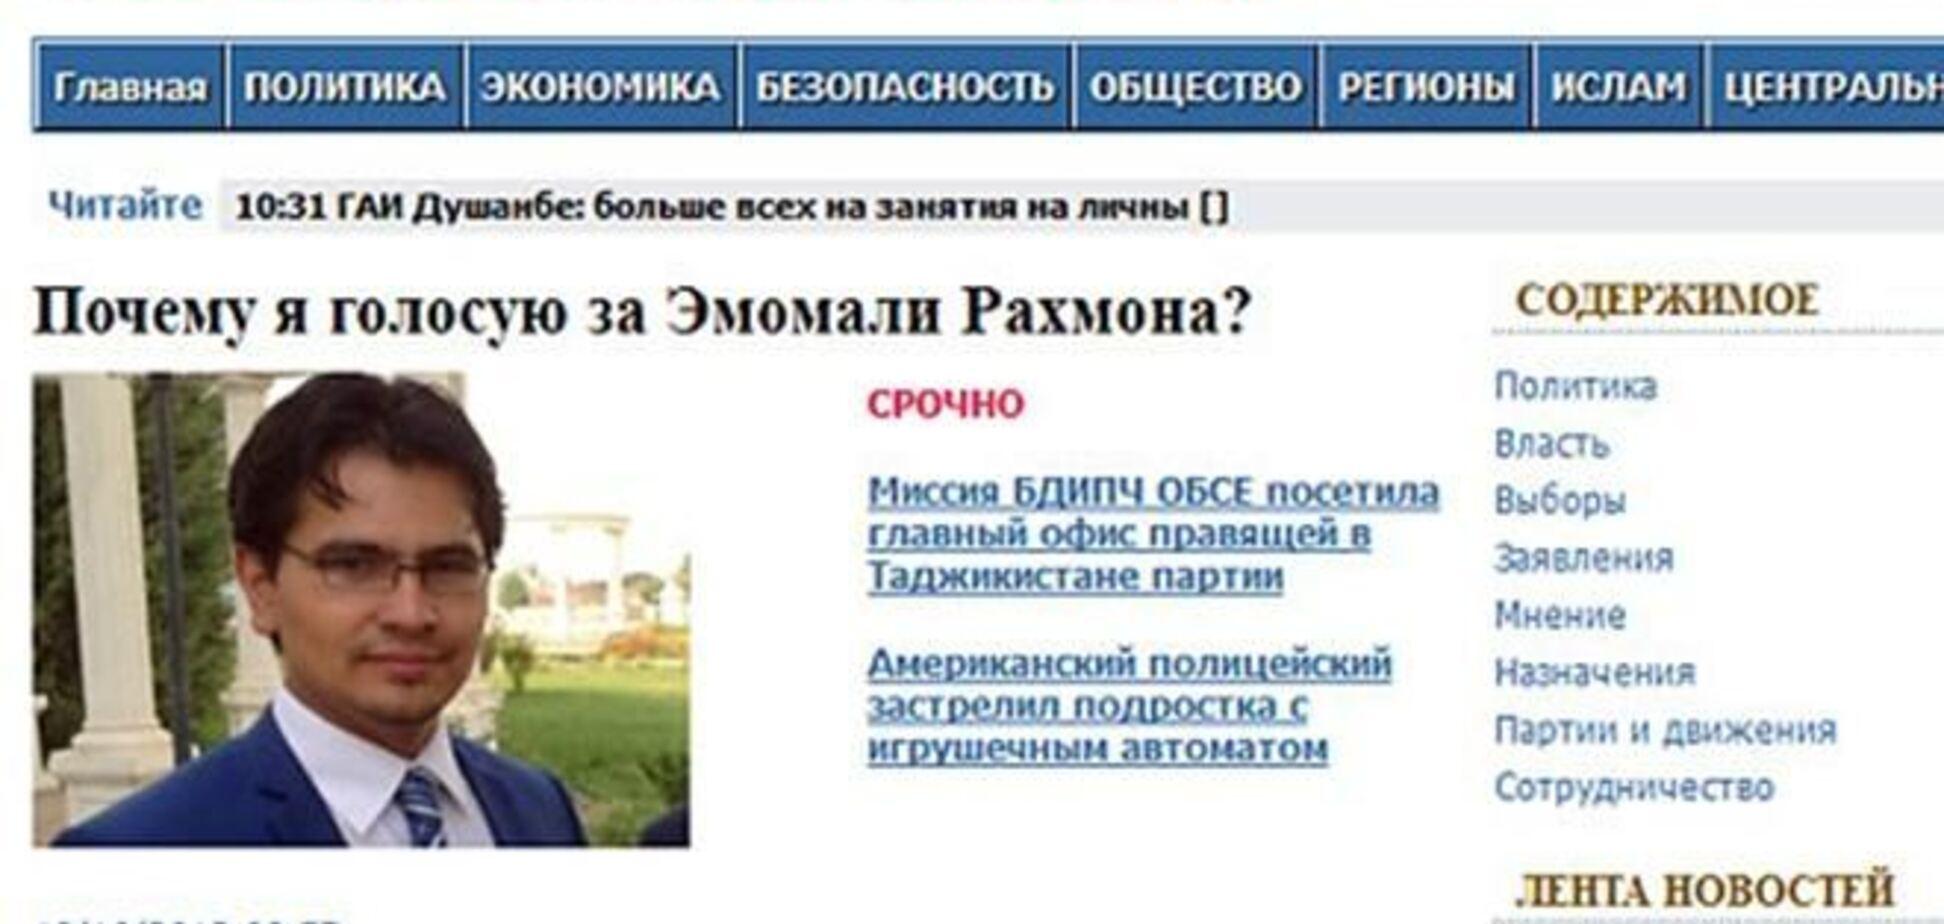 Команду президента Таджикистана уличили в плагиате идей Януковича